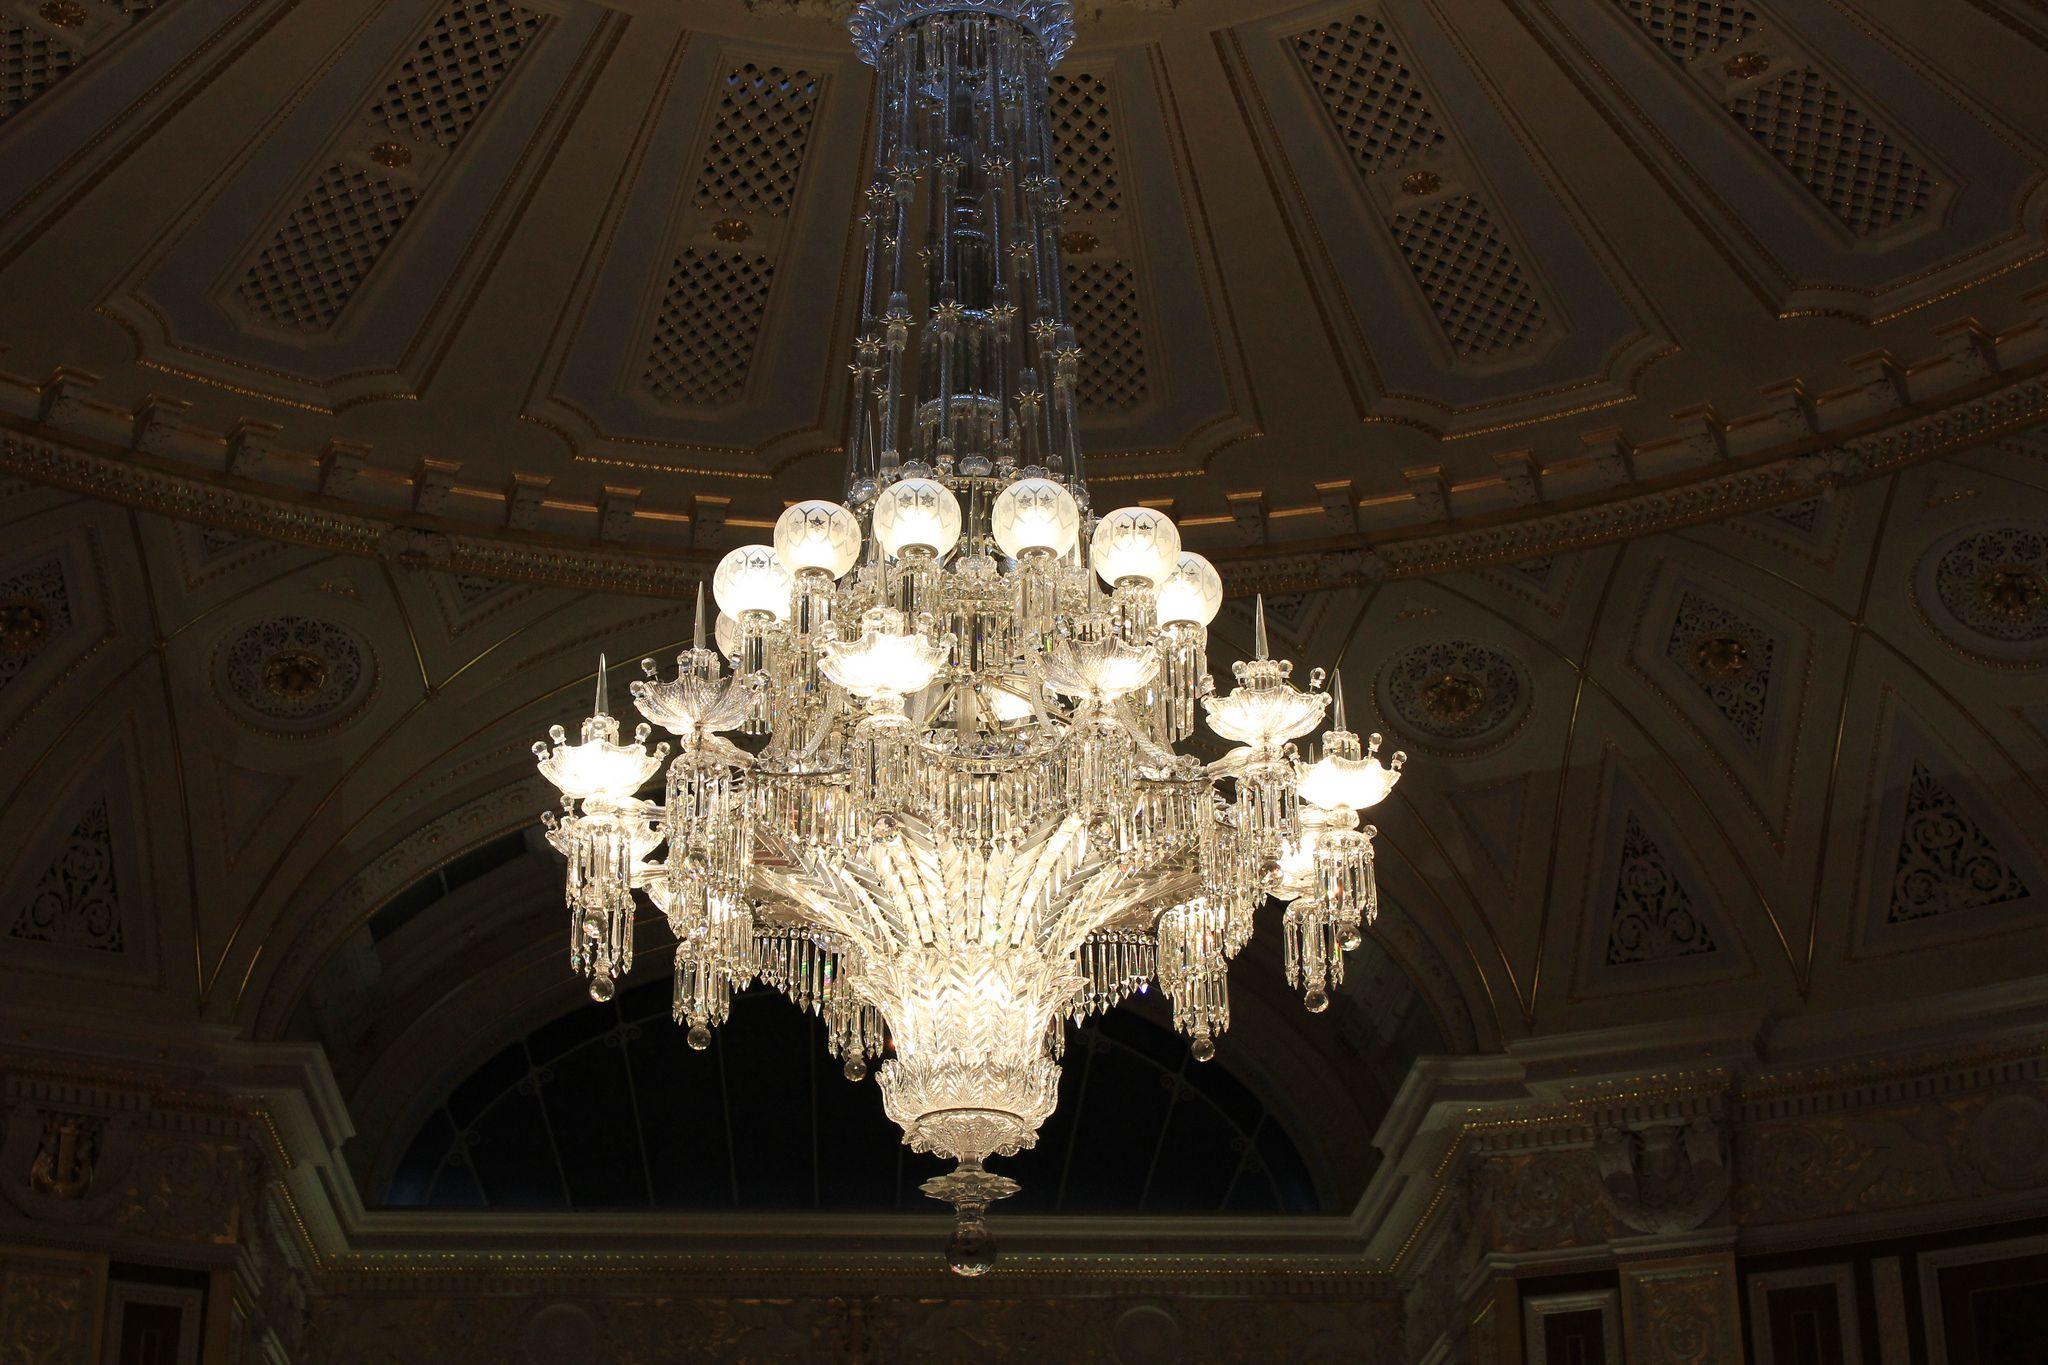 St George S Hall Concert Room Chandelier Chandelier Concert Extravagant